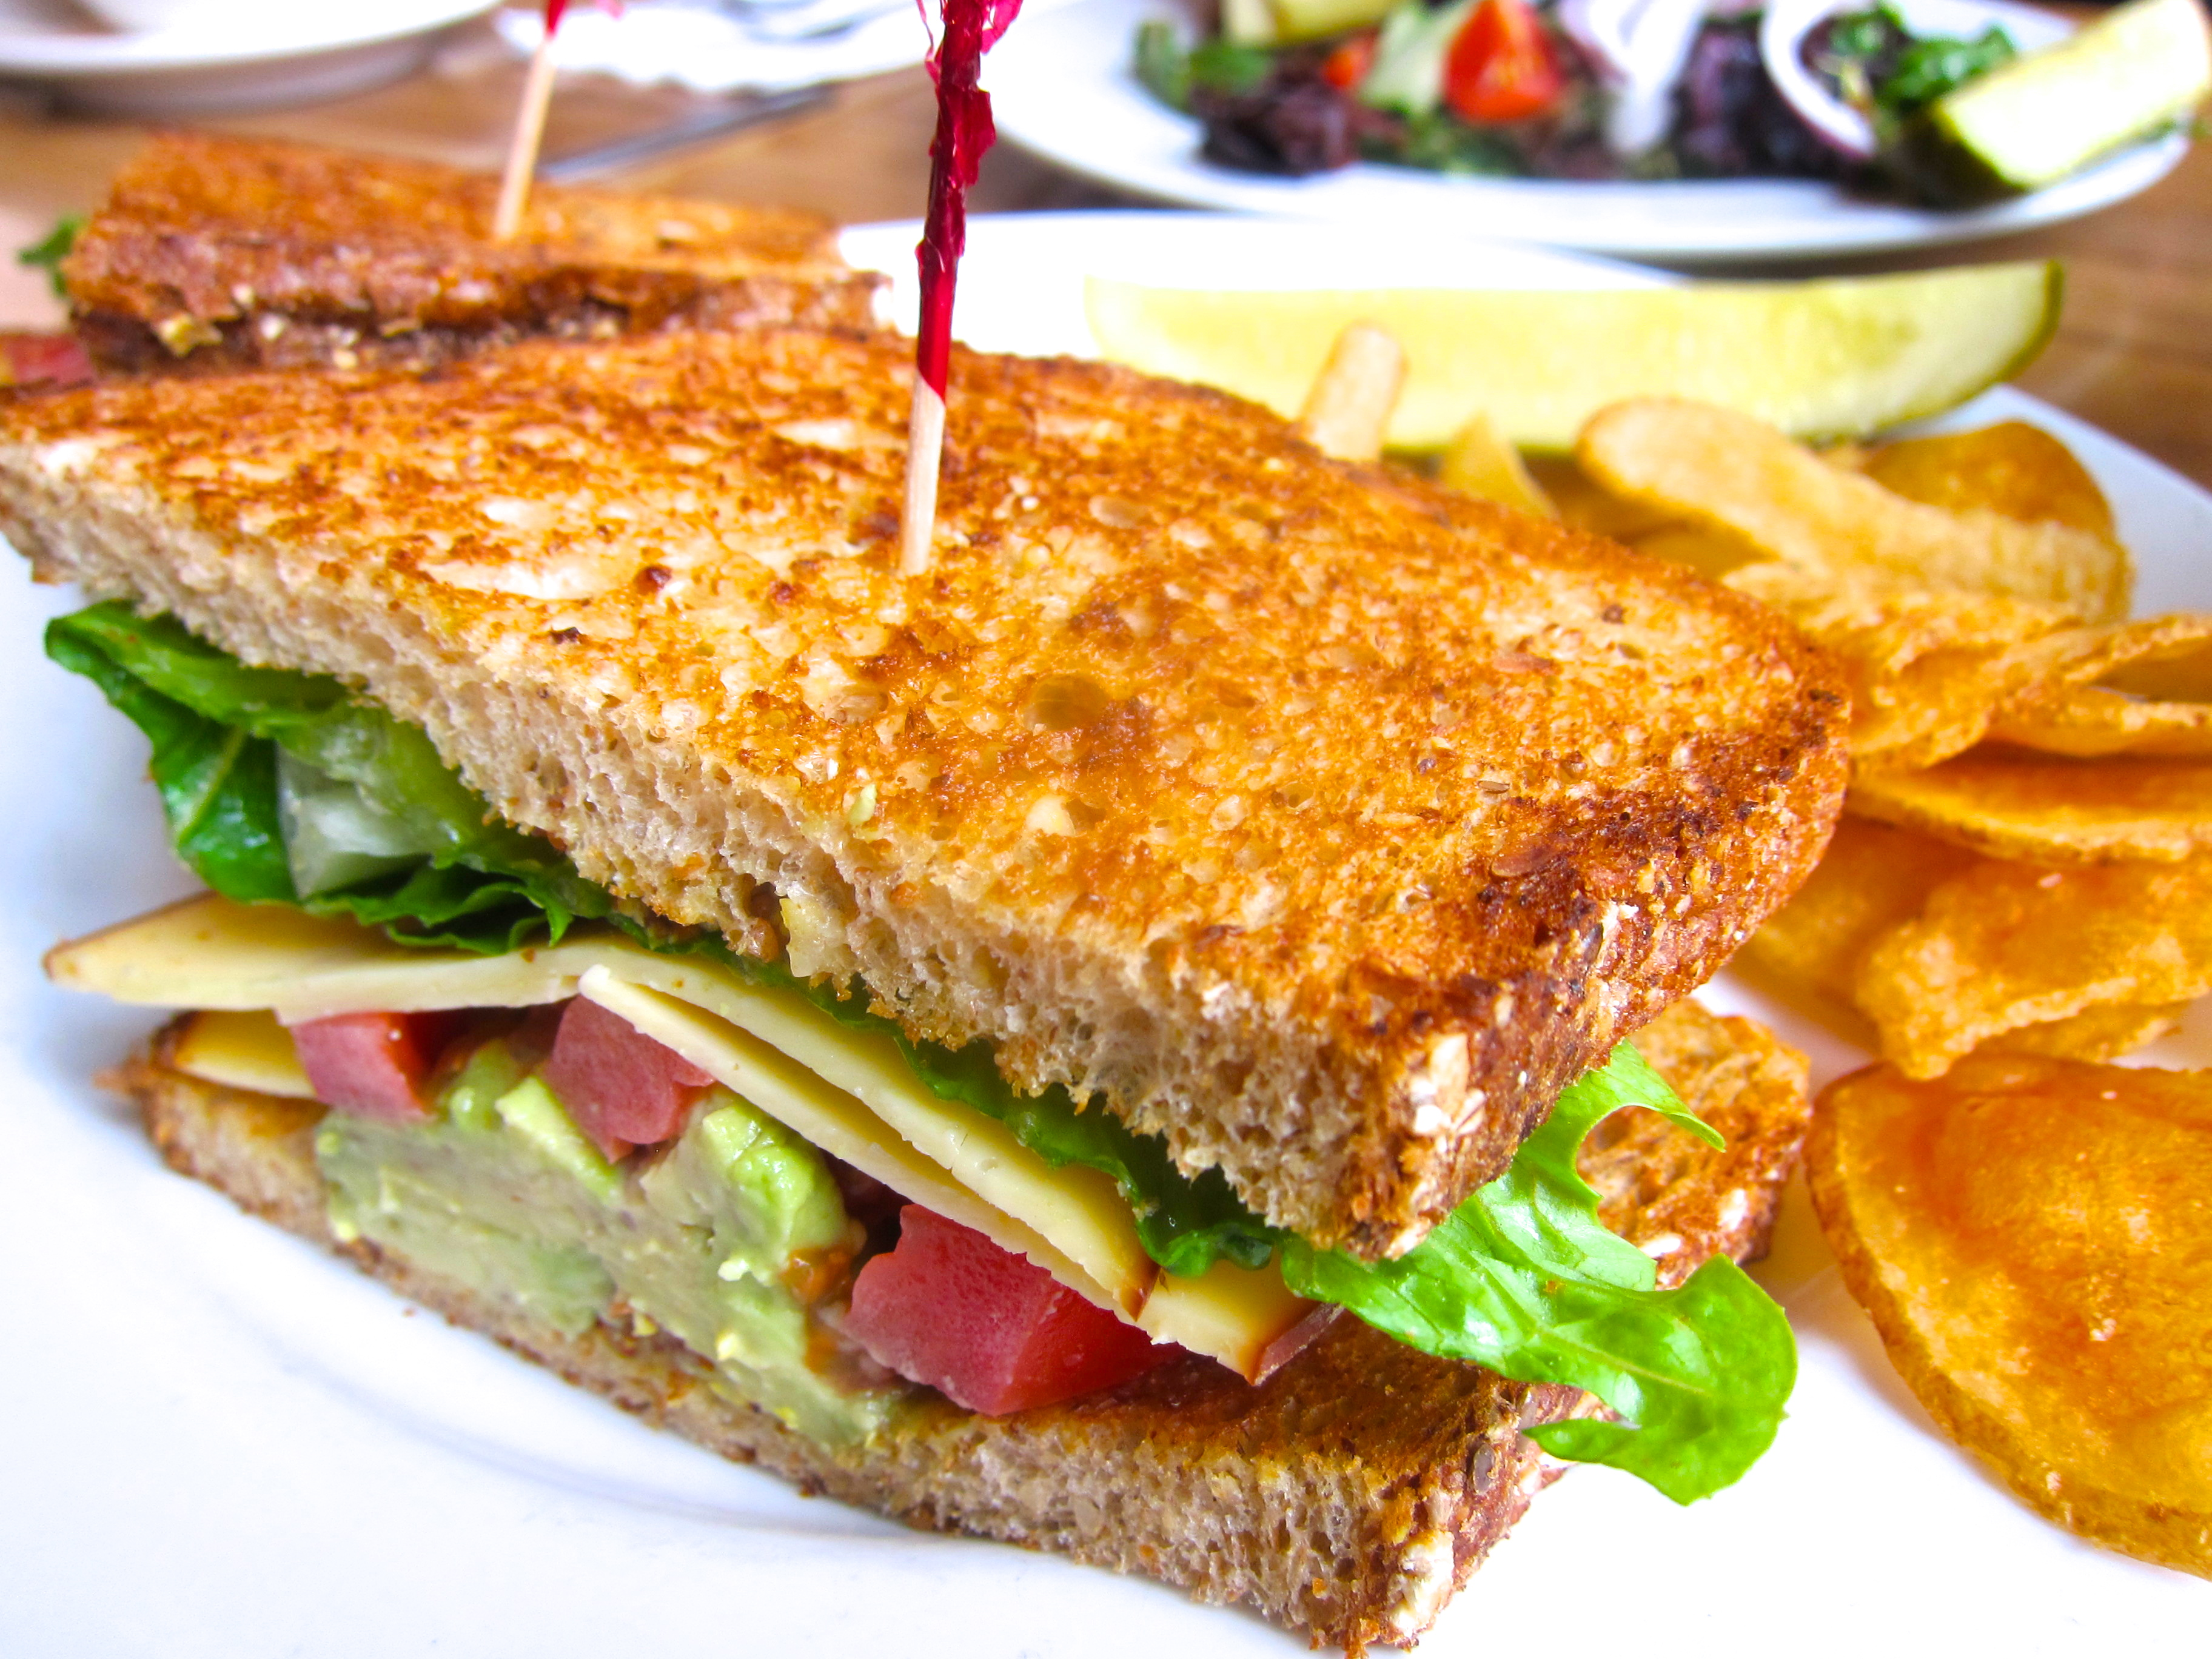 Vegan Bratwurst Whole Foods